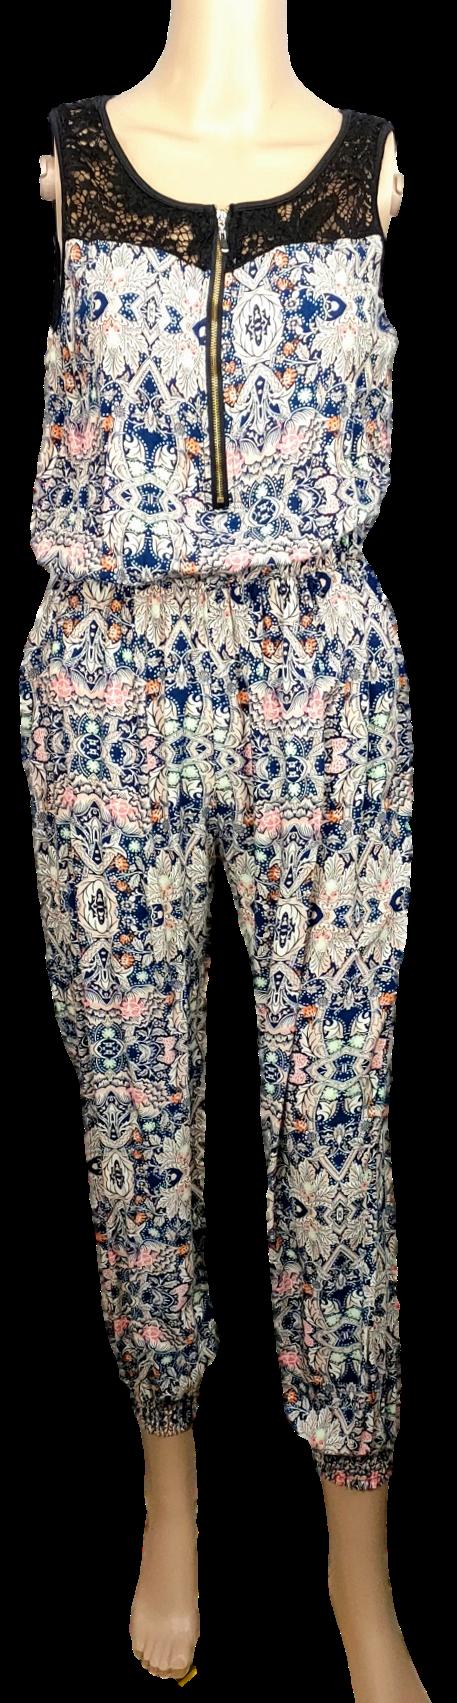 Combi-pantalon Airisa -Taille S